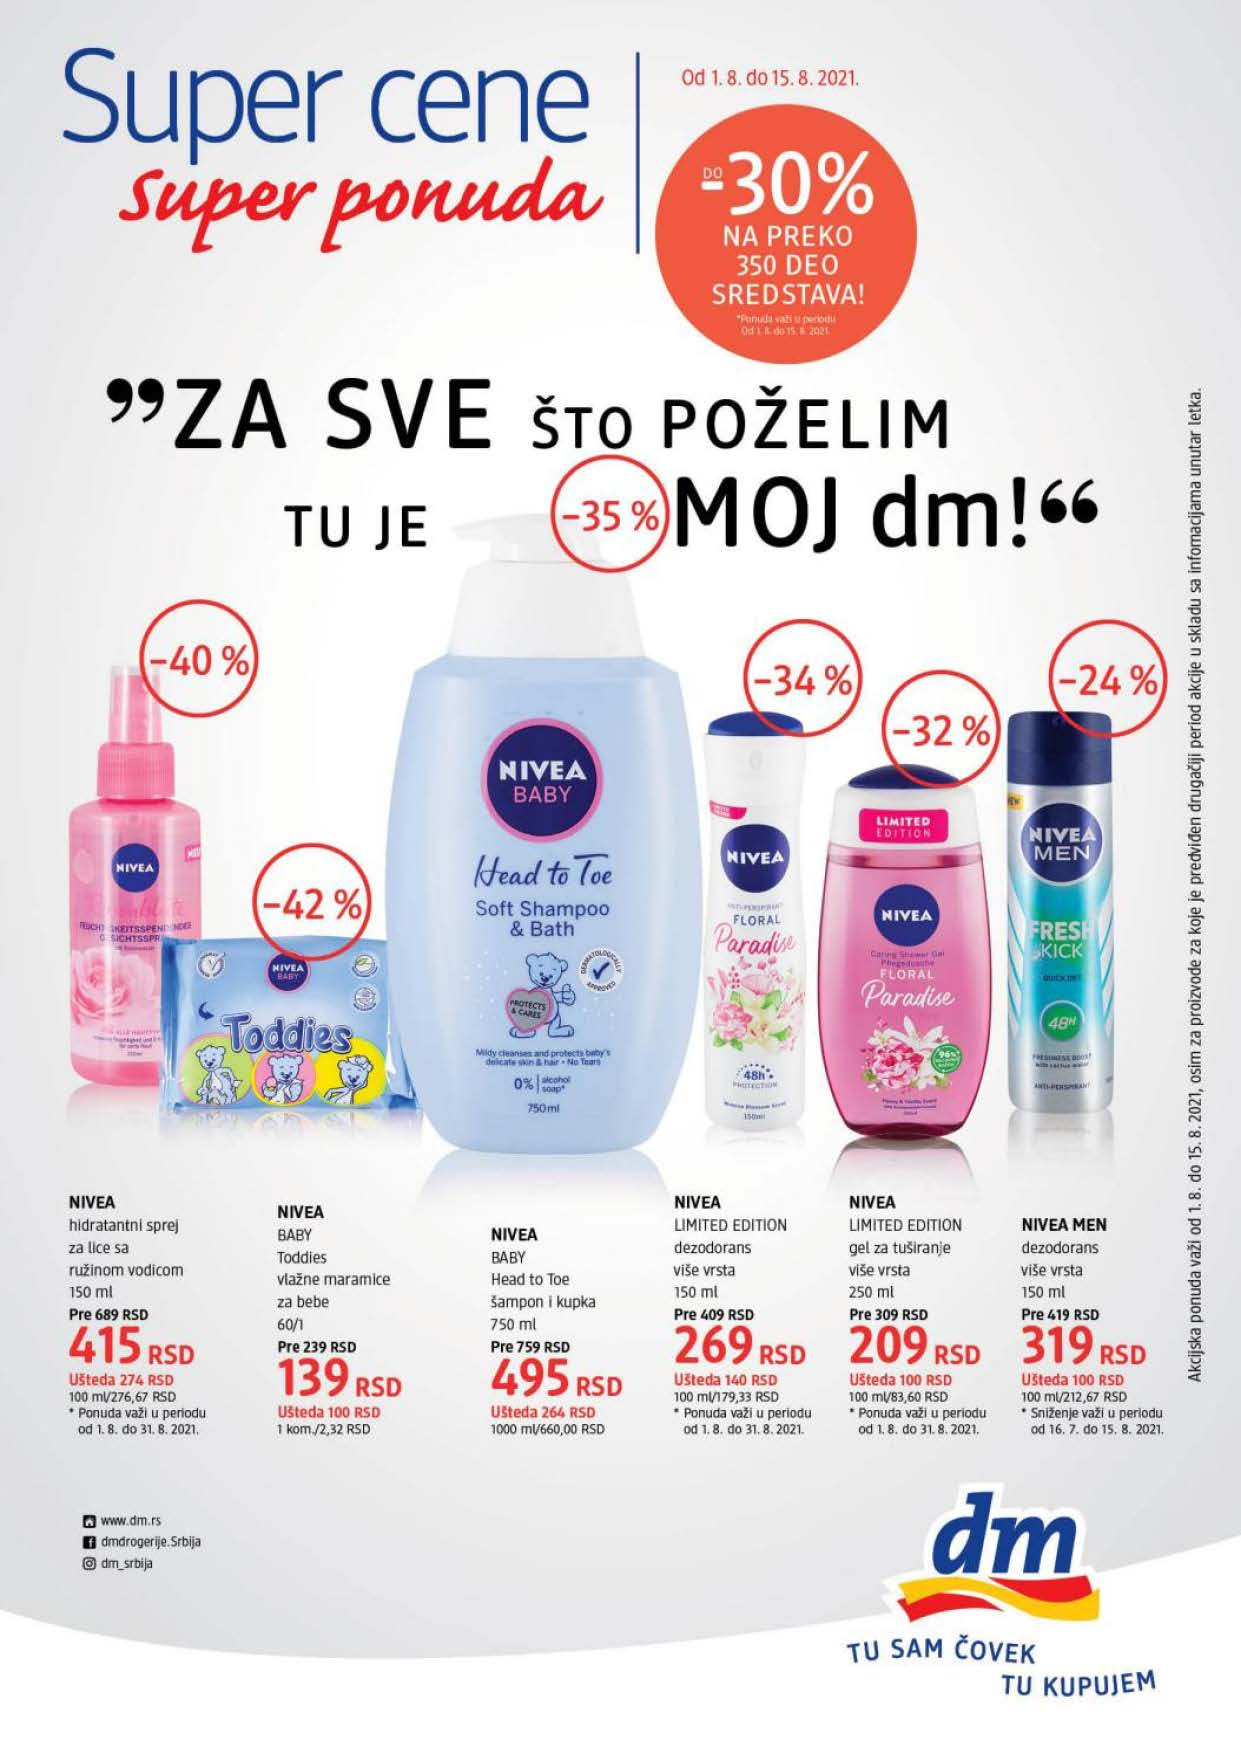 DM Srbija SUPER CENE Avgust 2021 1.8.2021. 15.8.2021. Page 1 1